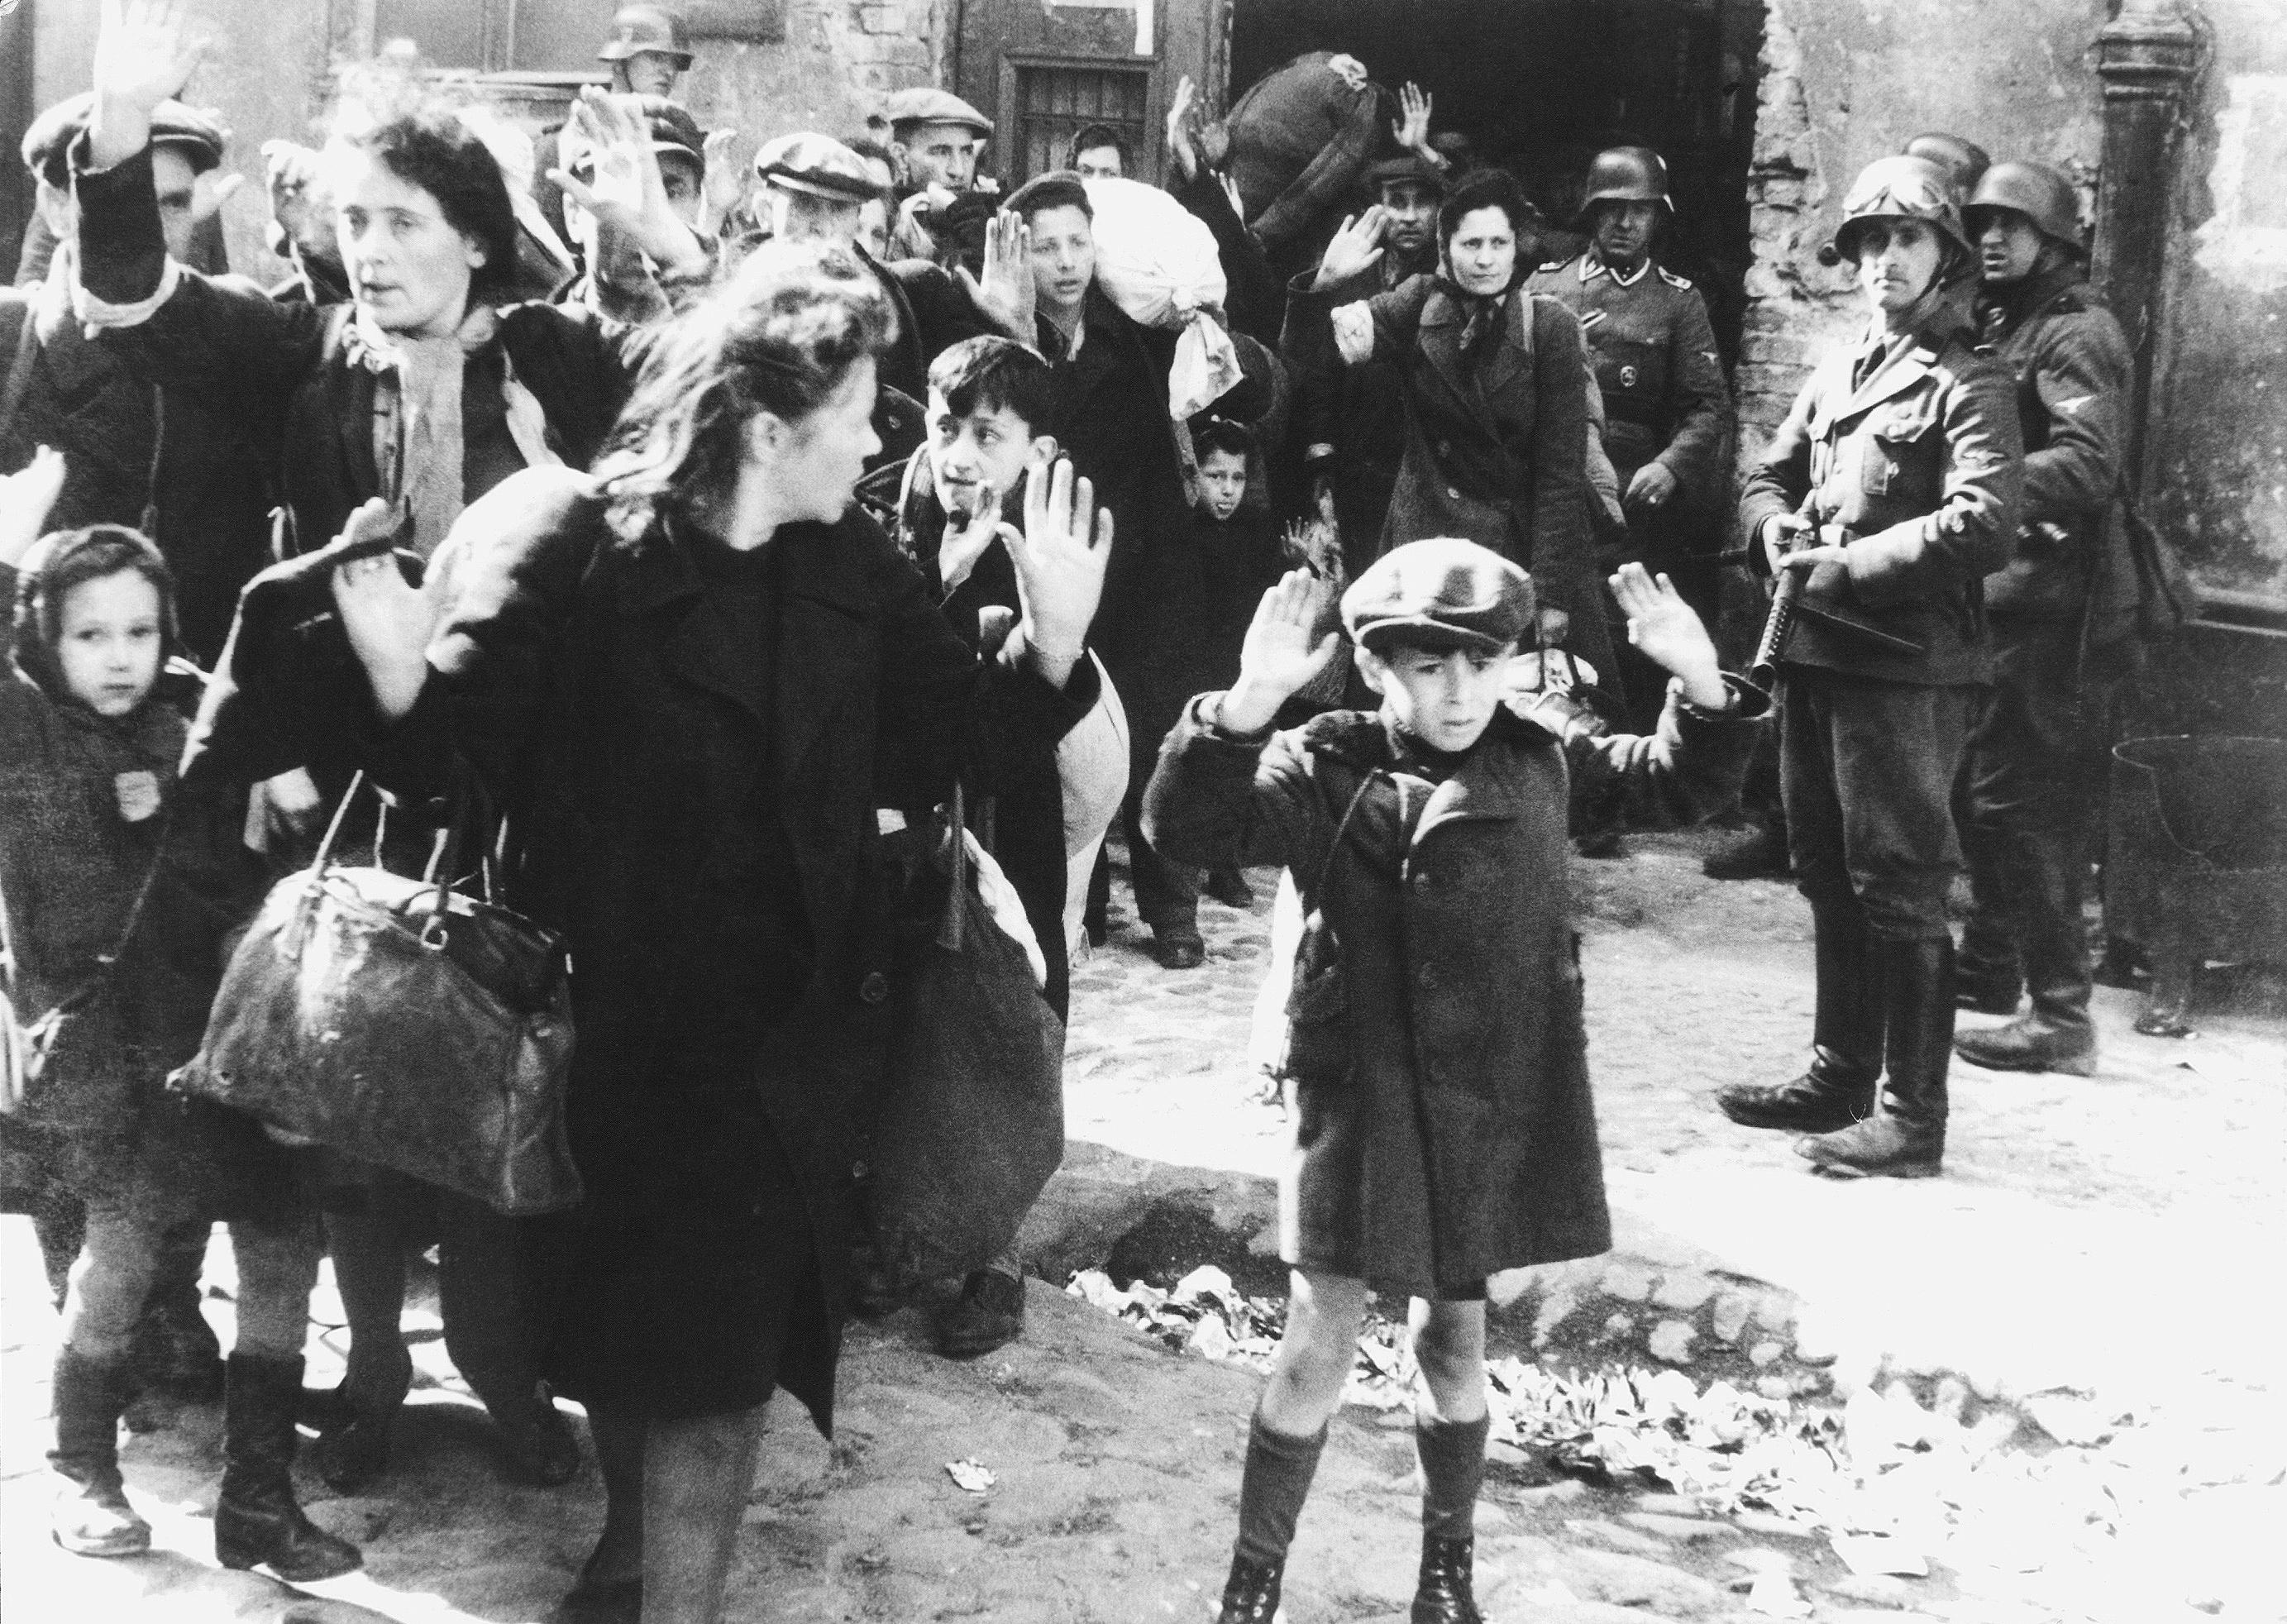 Niño judío se rinde en Varsovia - Wikipedia, la enciclopedia libre